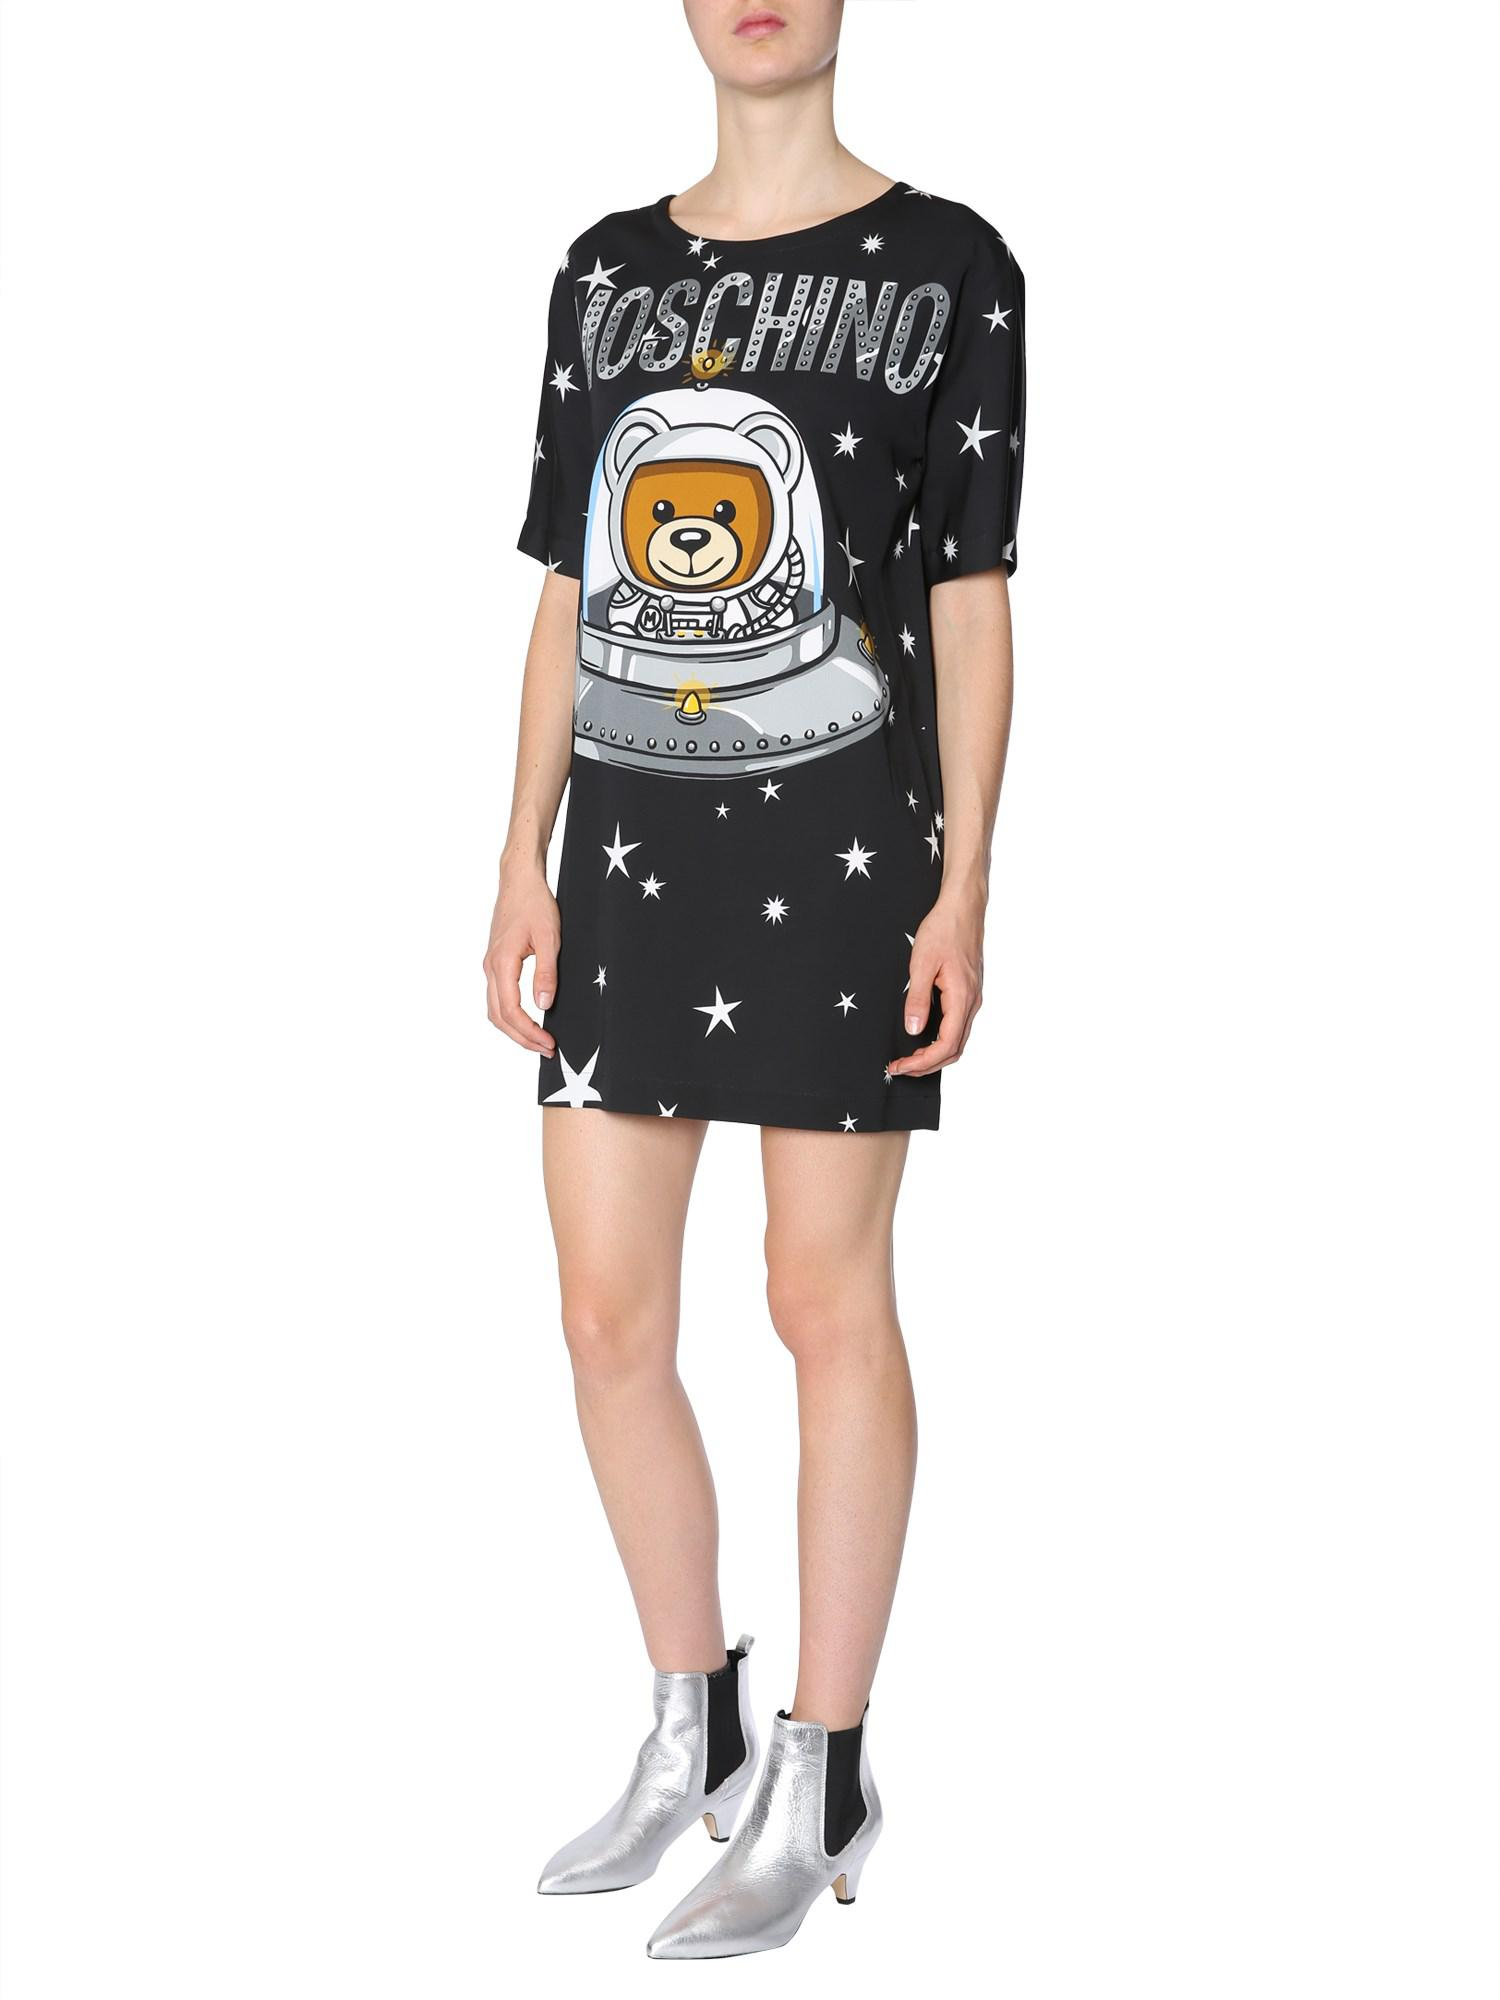 fb6cfff0a2c7 Lyst - Moschino Teddy Bear Printed Viscose Dress in Black - Save ...